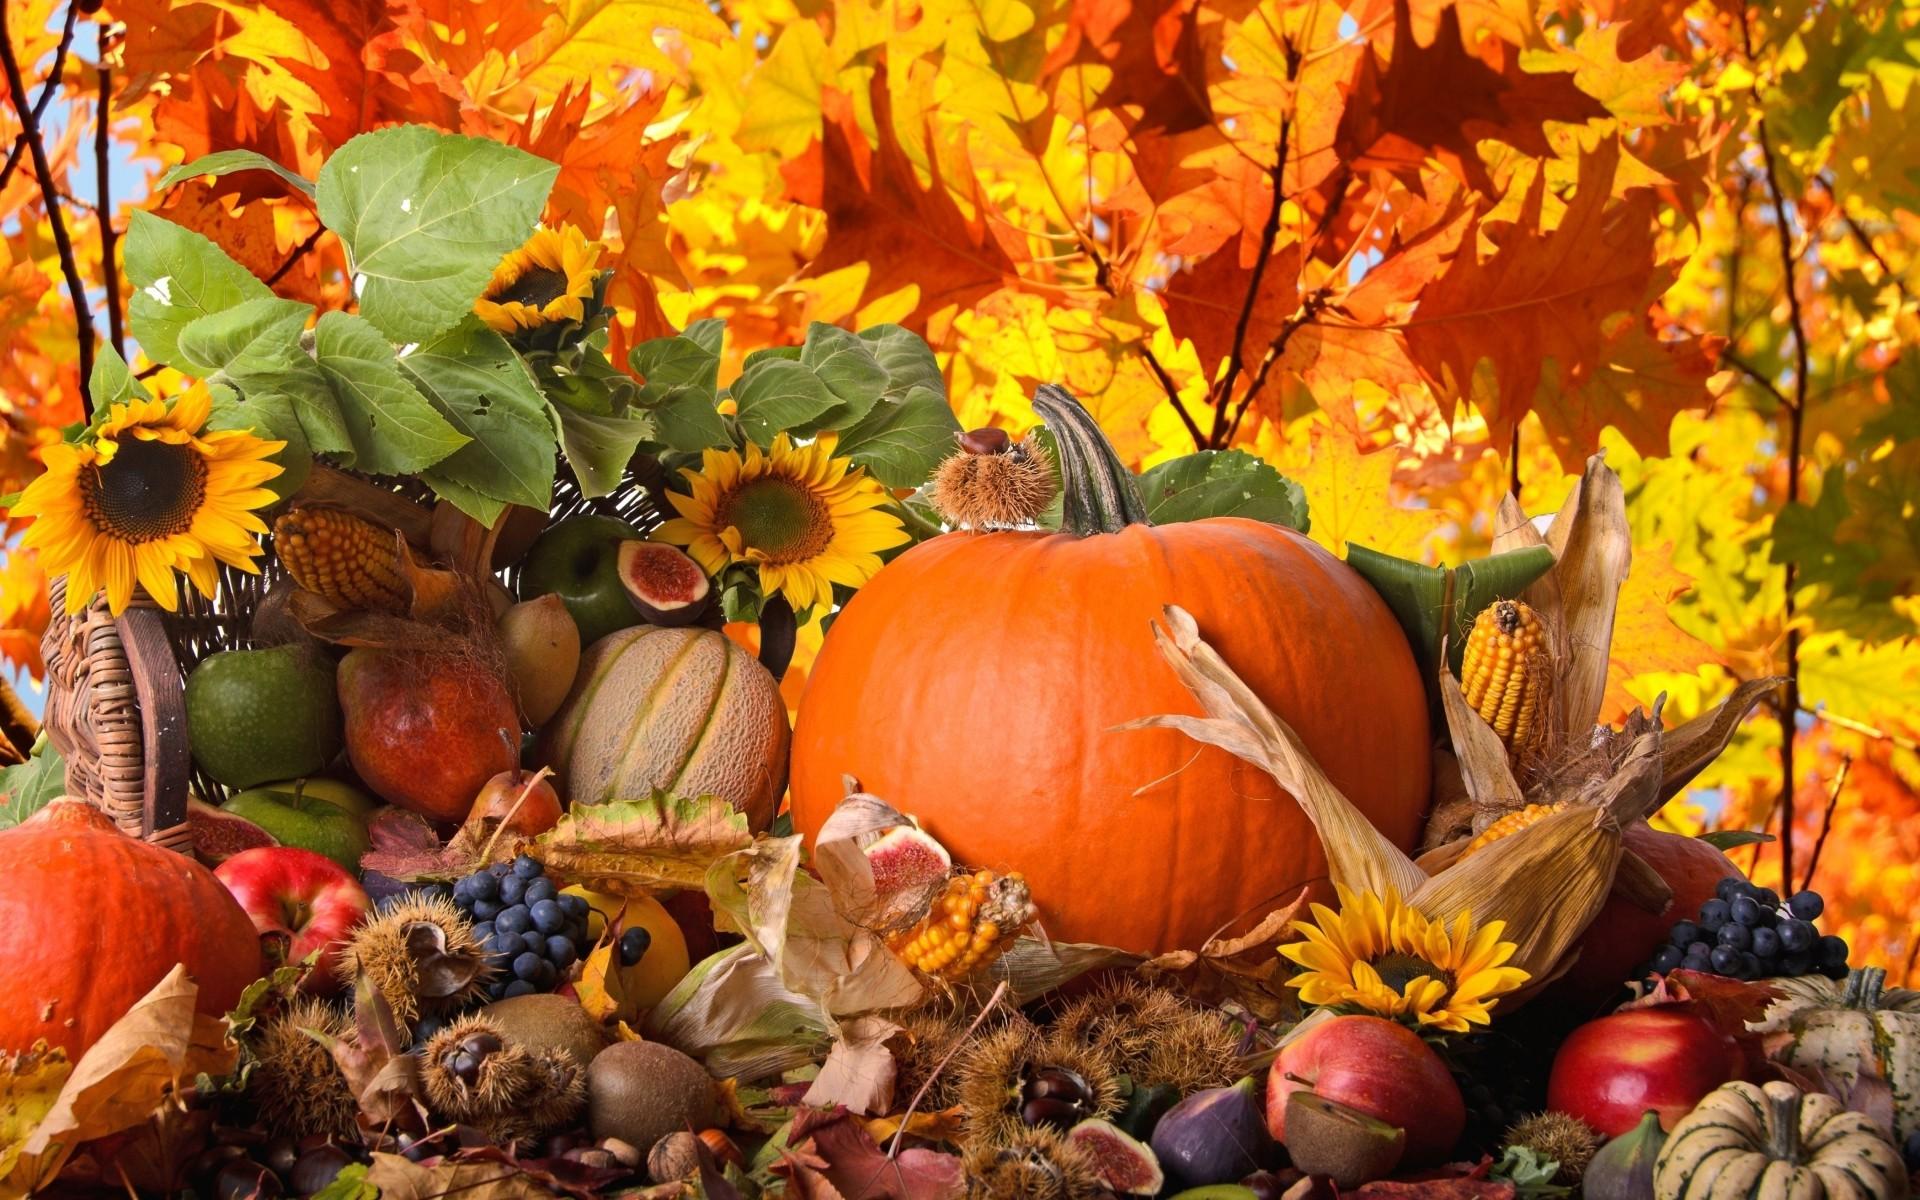 Thanksgiving Wallpapers Mobile - Thanksgiving Desktop Background , HD Wallpaper & Backgrounds